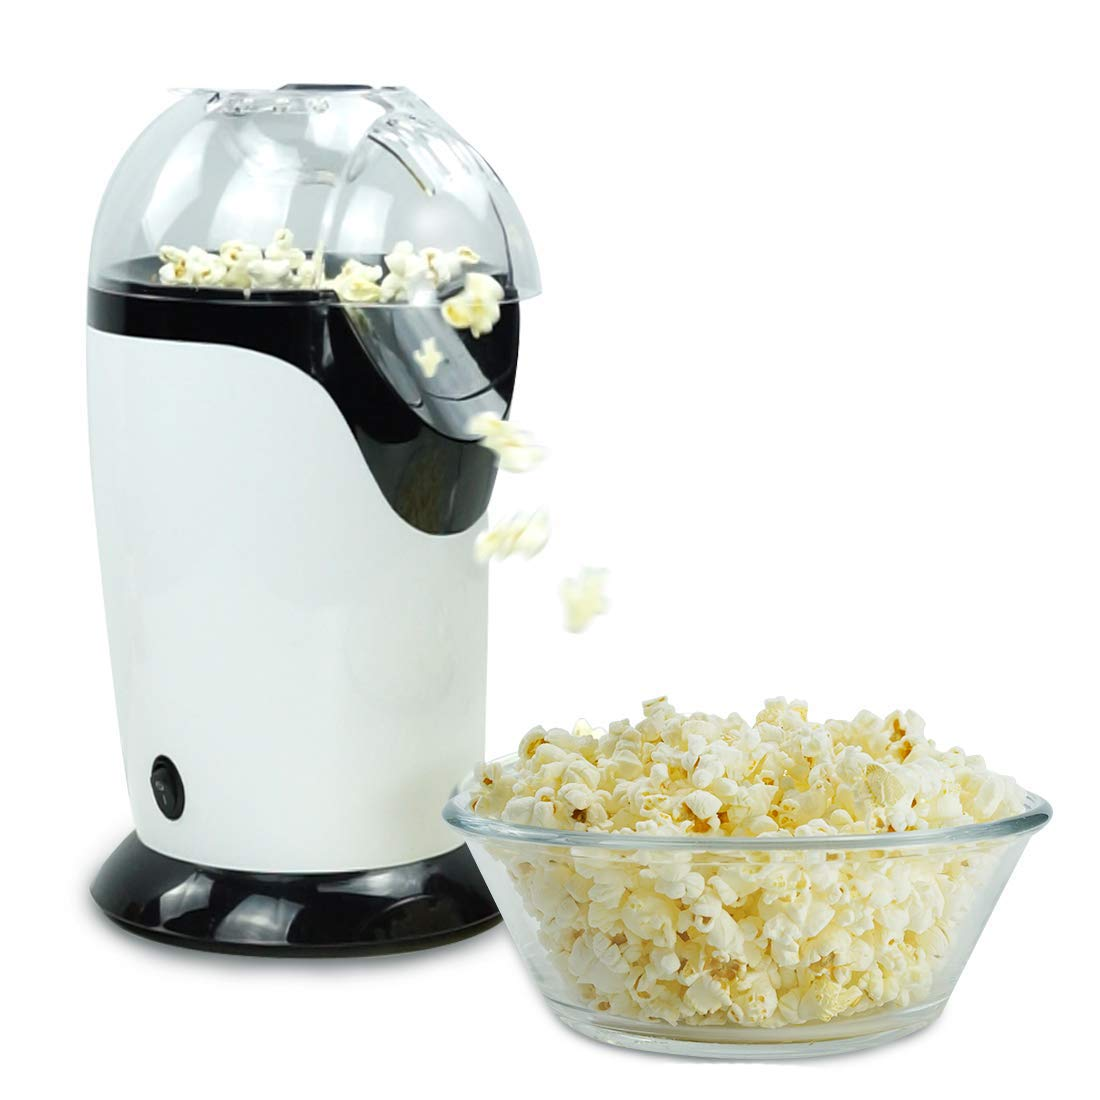 Popper de palomitas de maíz de aire caliente, máquina de hacer palomitas de maíz, máquina eléctrica